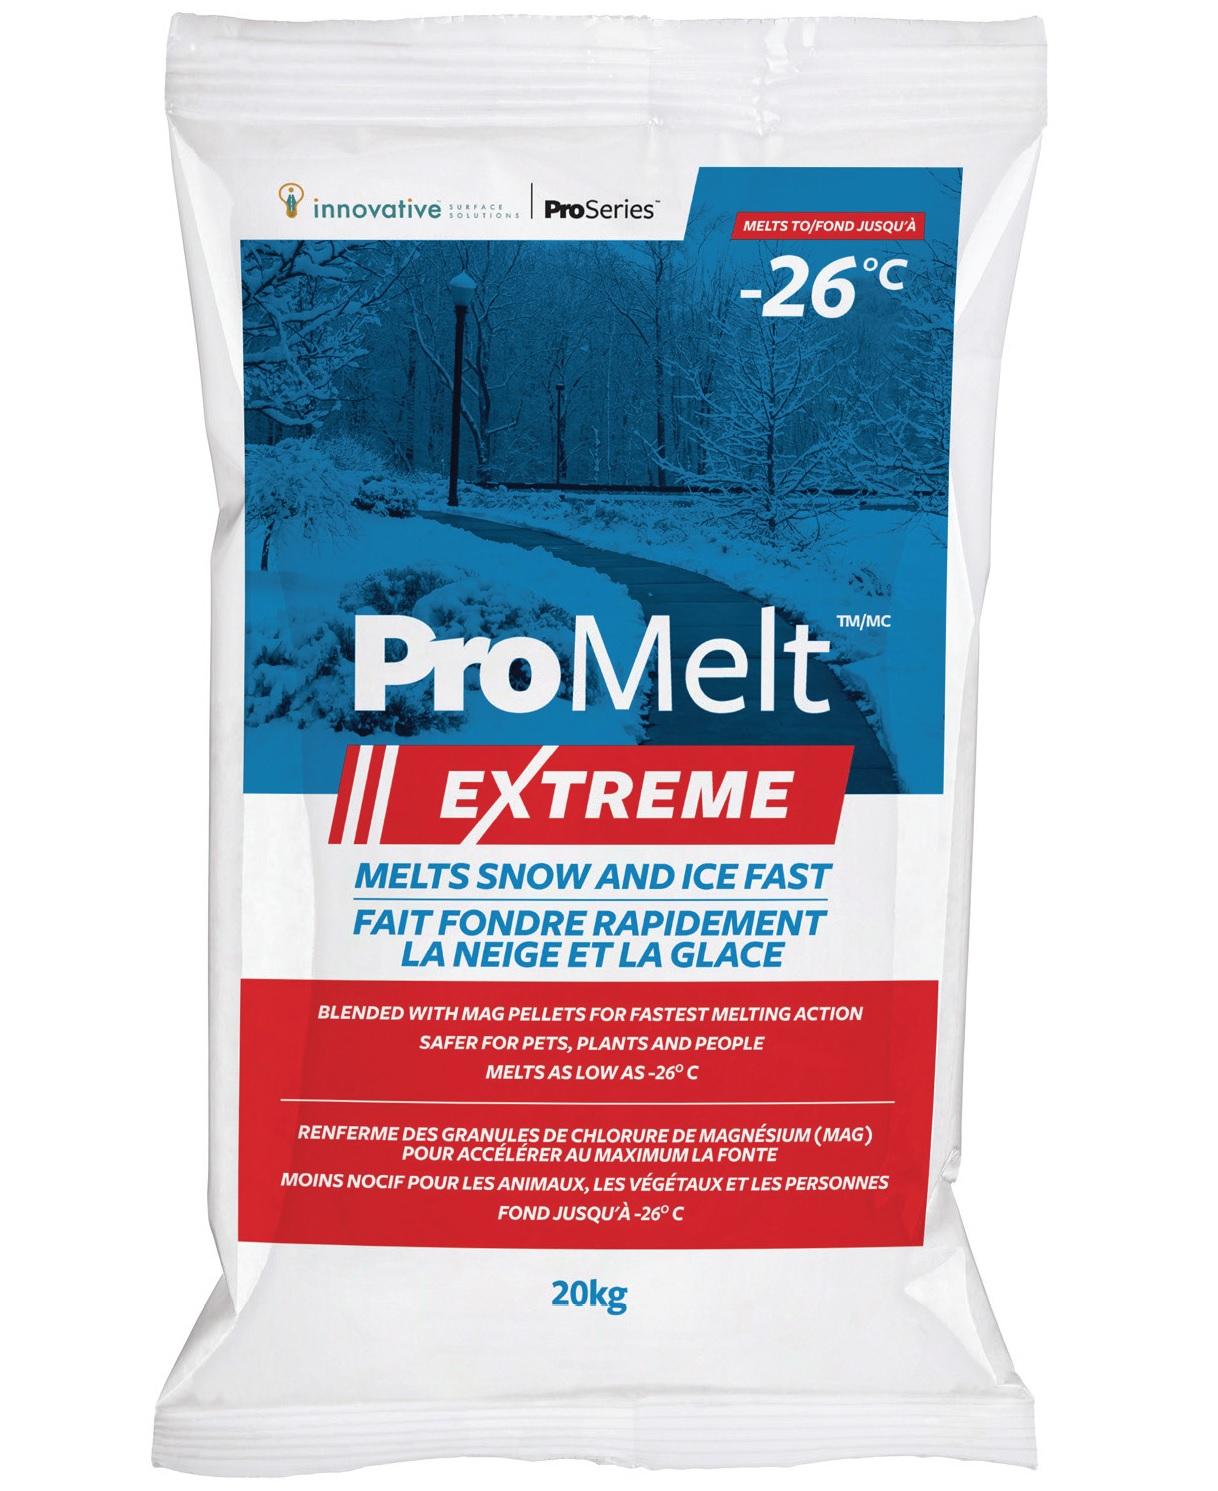 ProMelt Extreme Ice Melter, 20kg bags